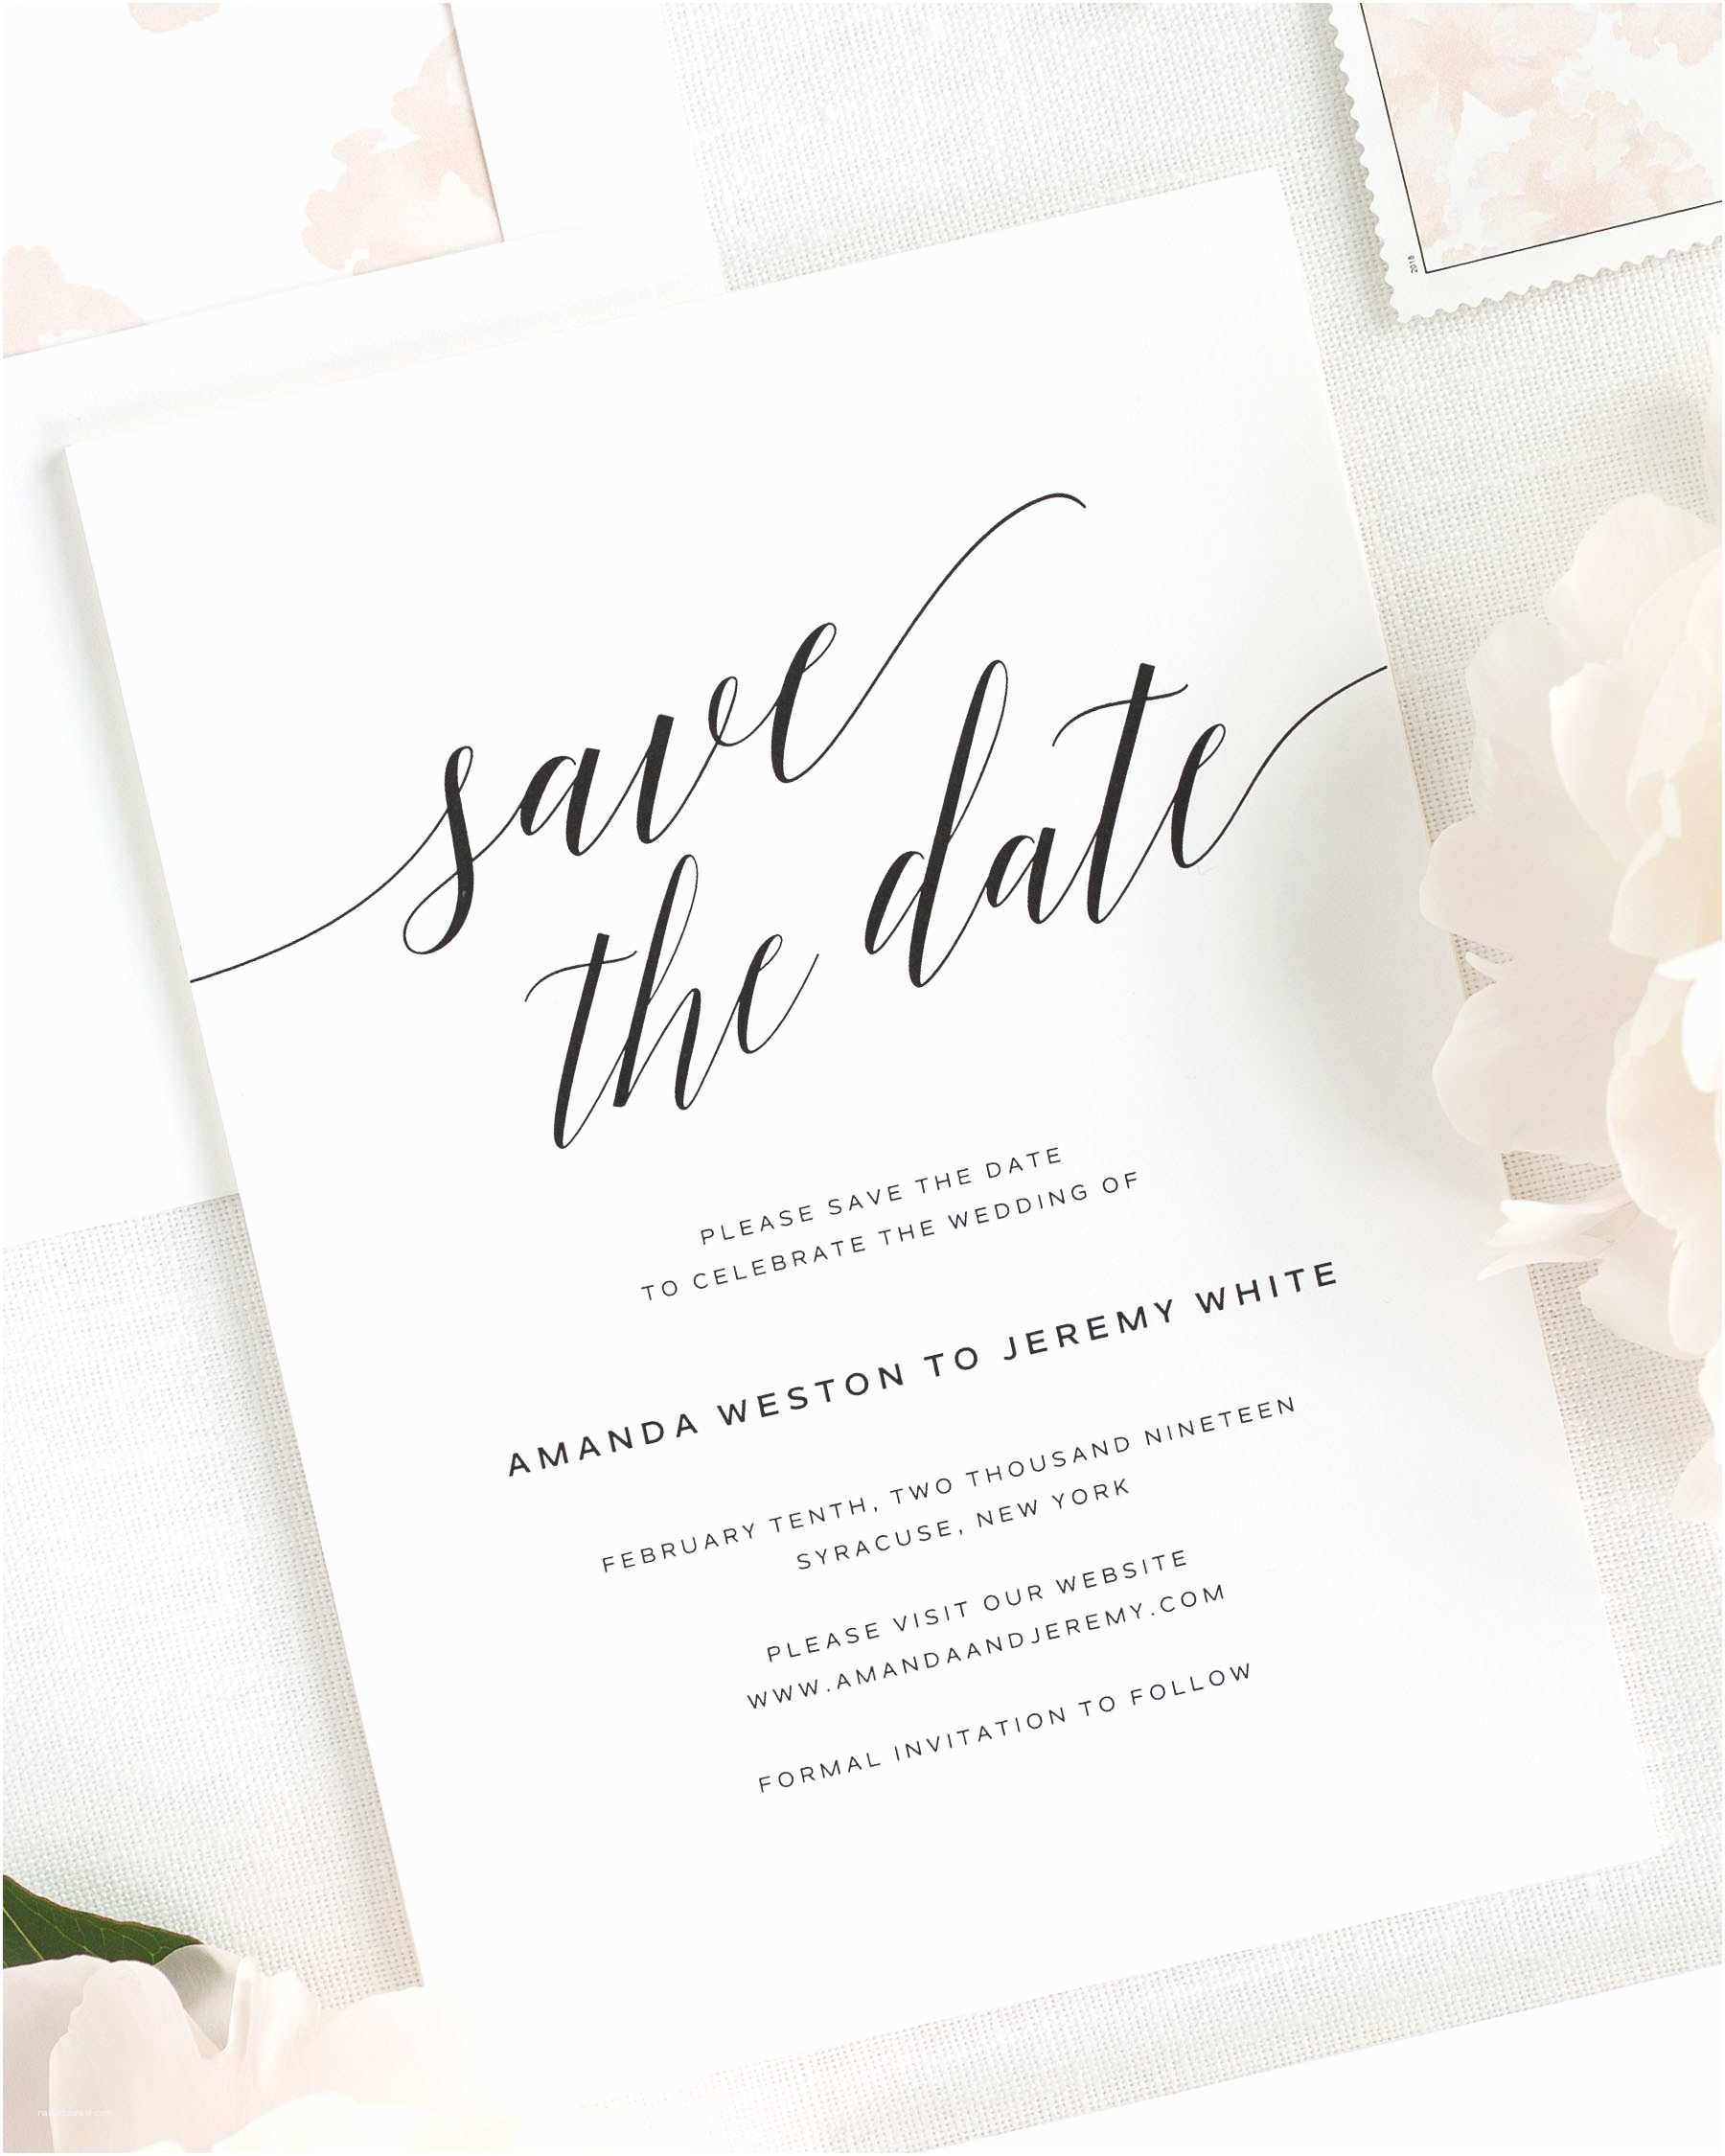 Save the Date Wedding Invitations Daring Romance Save the Date Cards Save the Date Cards